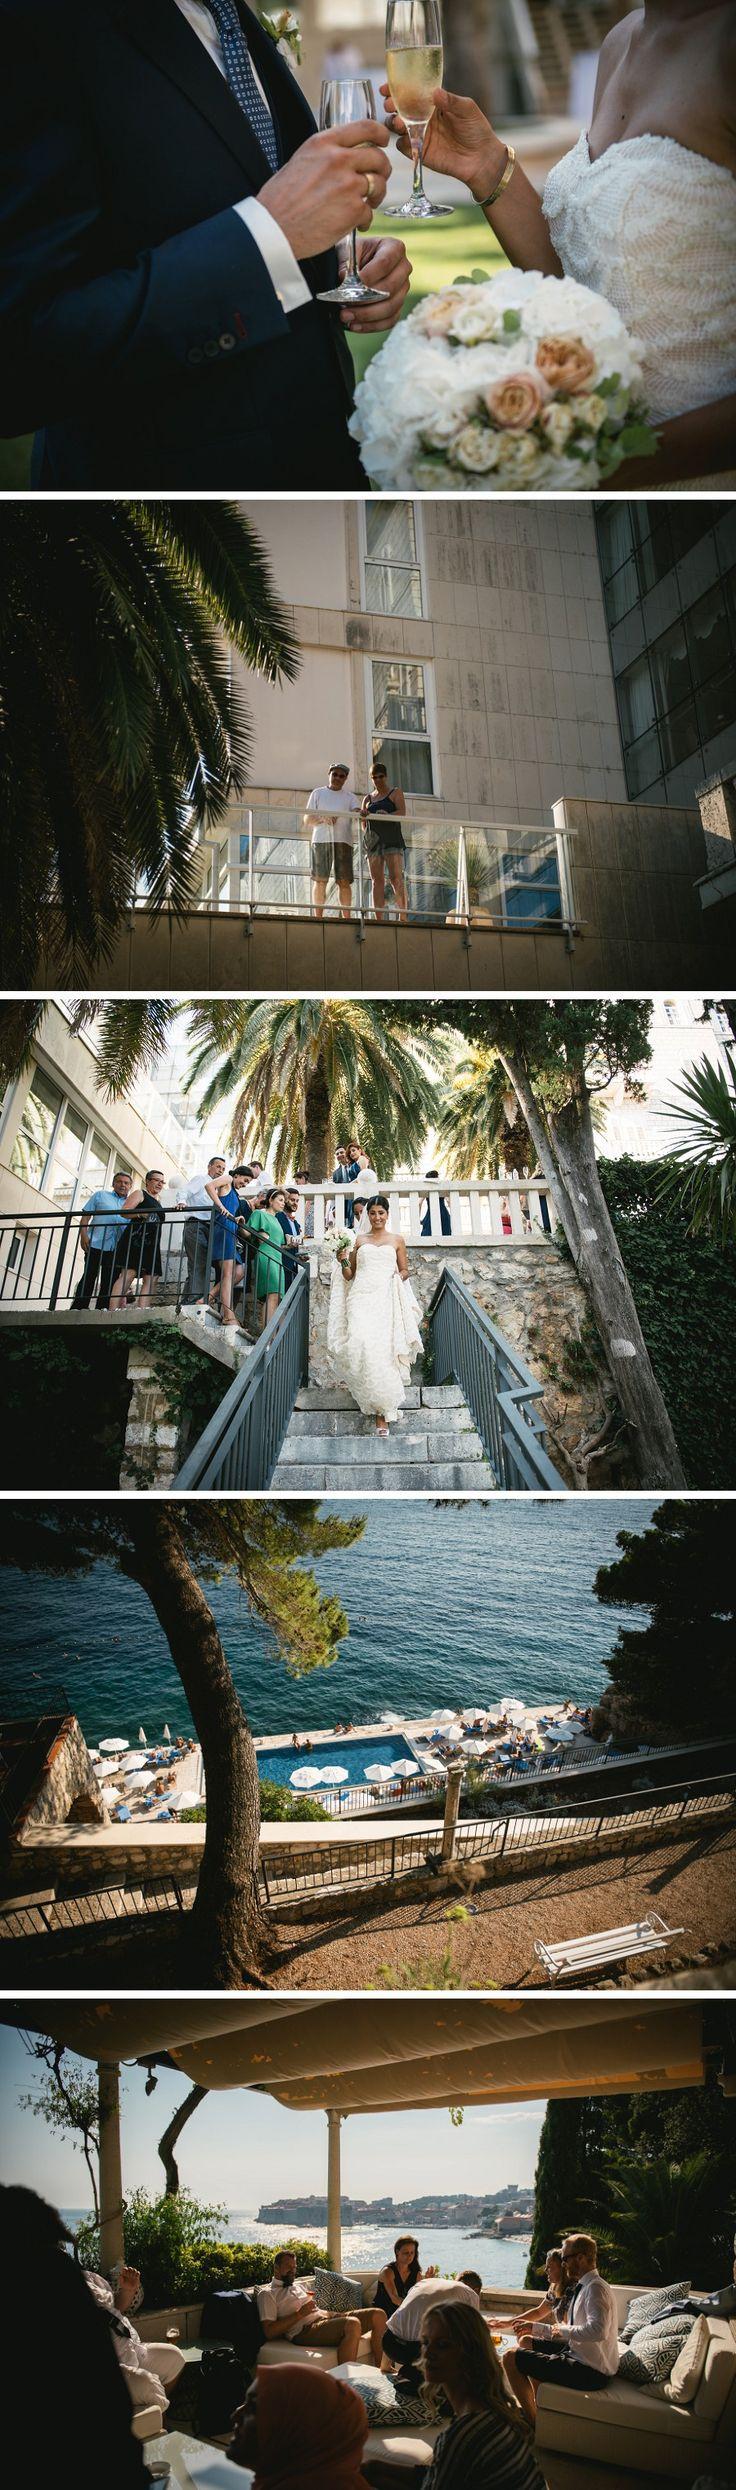 Grand villa argentina hotel - Dubrovnil, Croatia - destination wedding - swimming pool by the sea - Zephyr & Luna photograhy